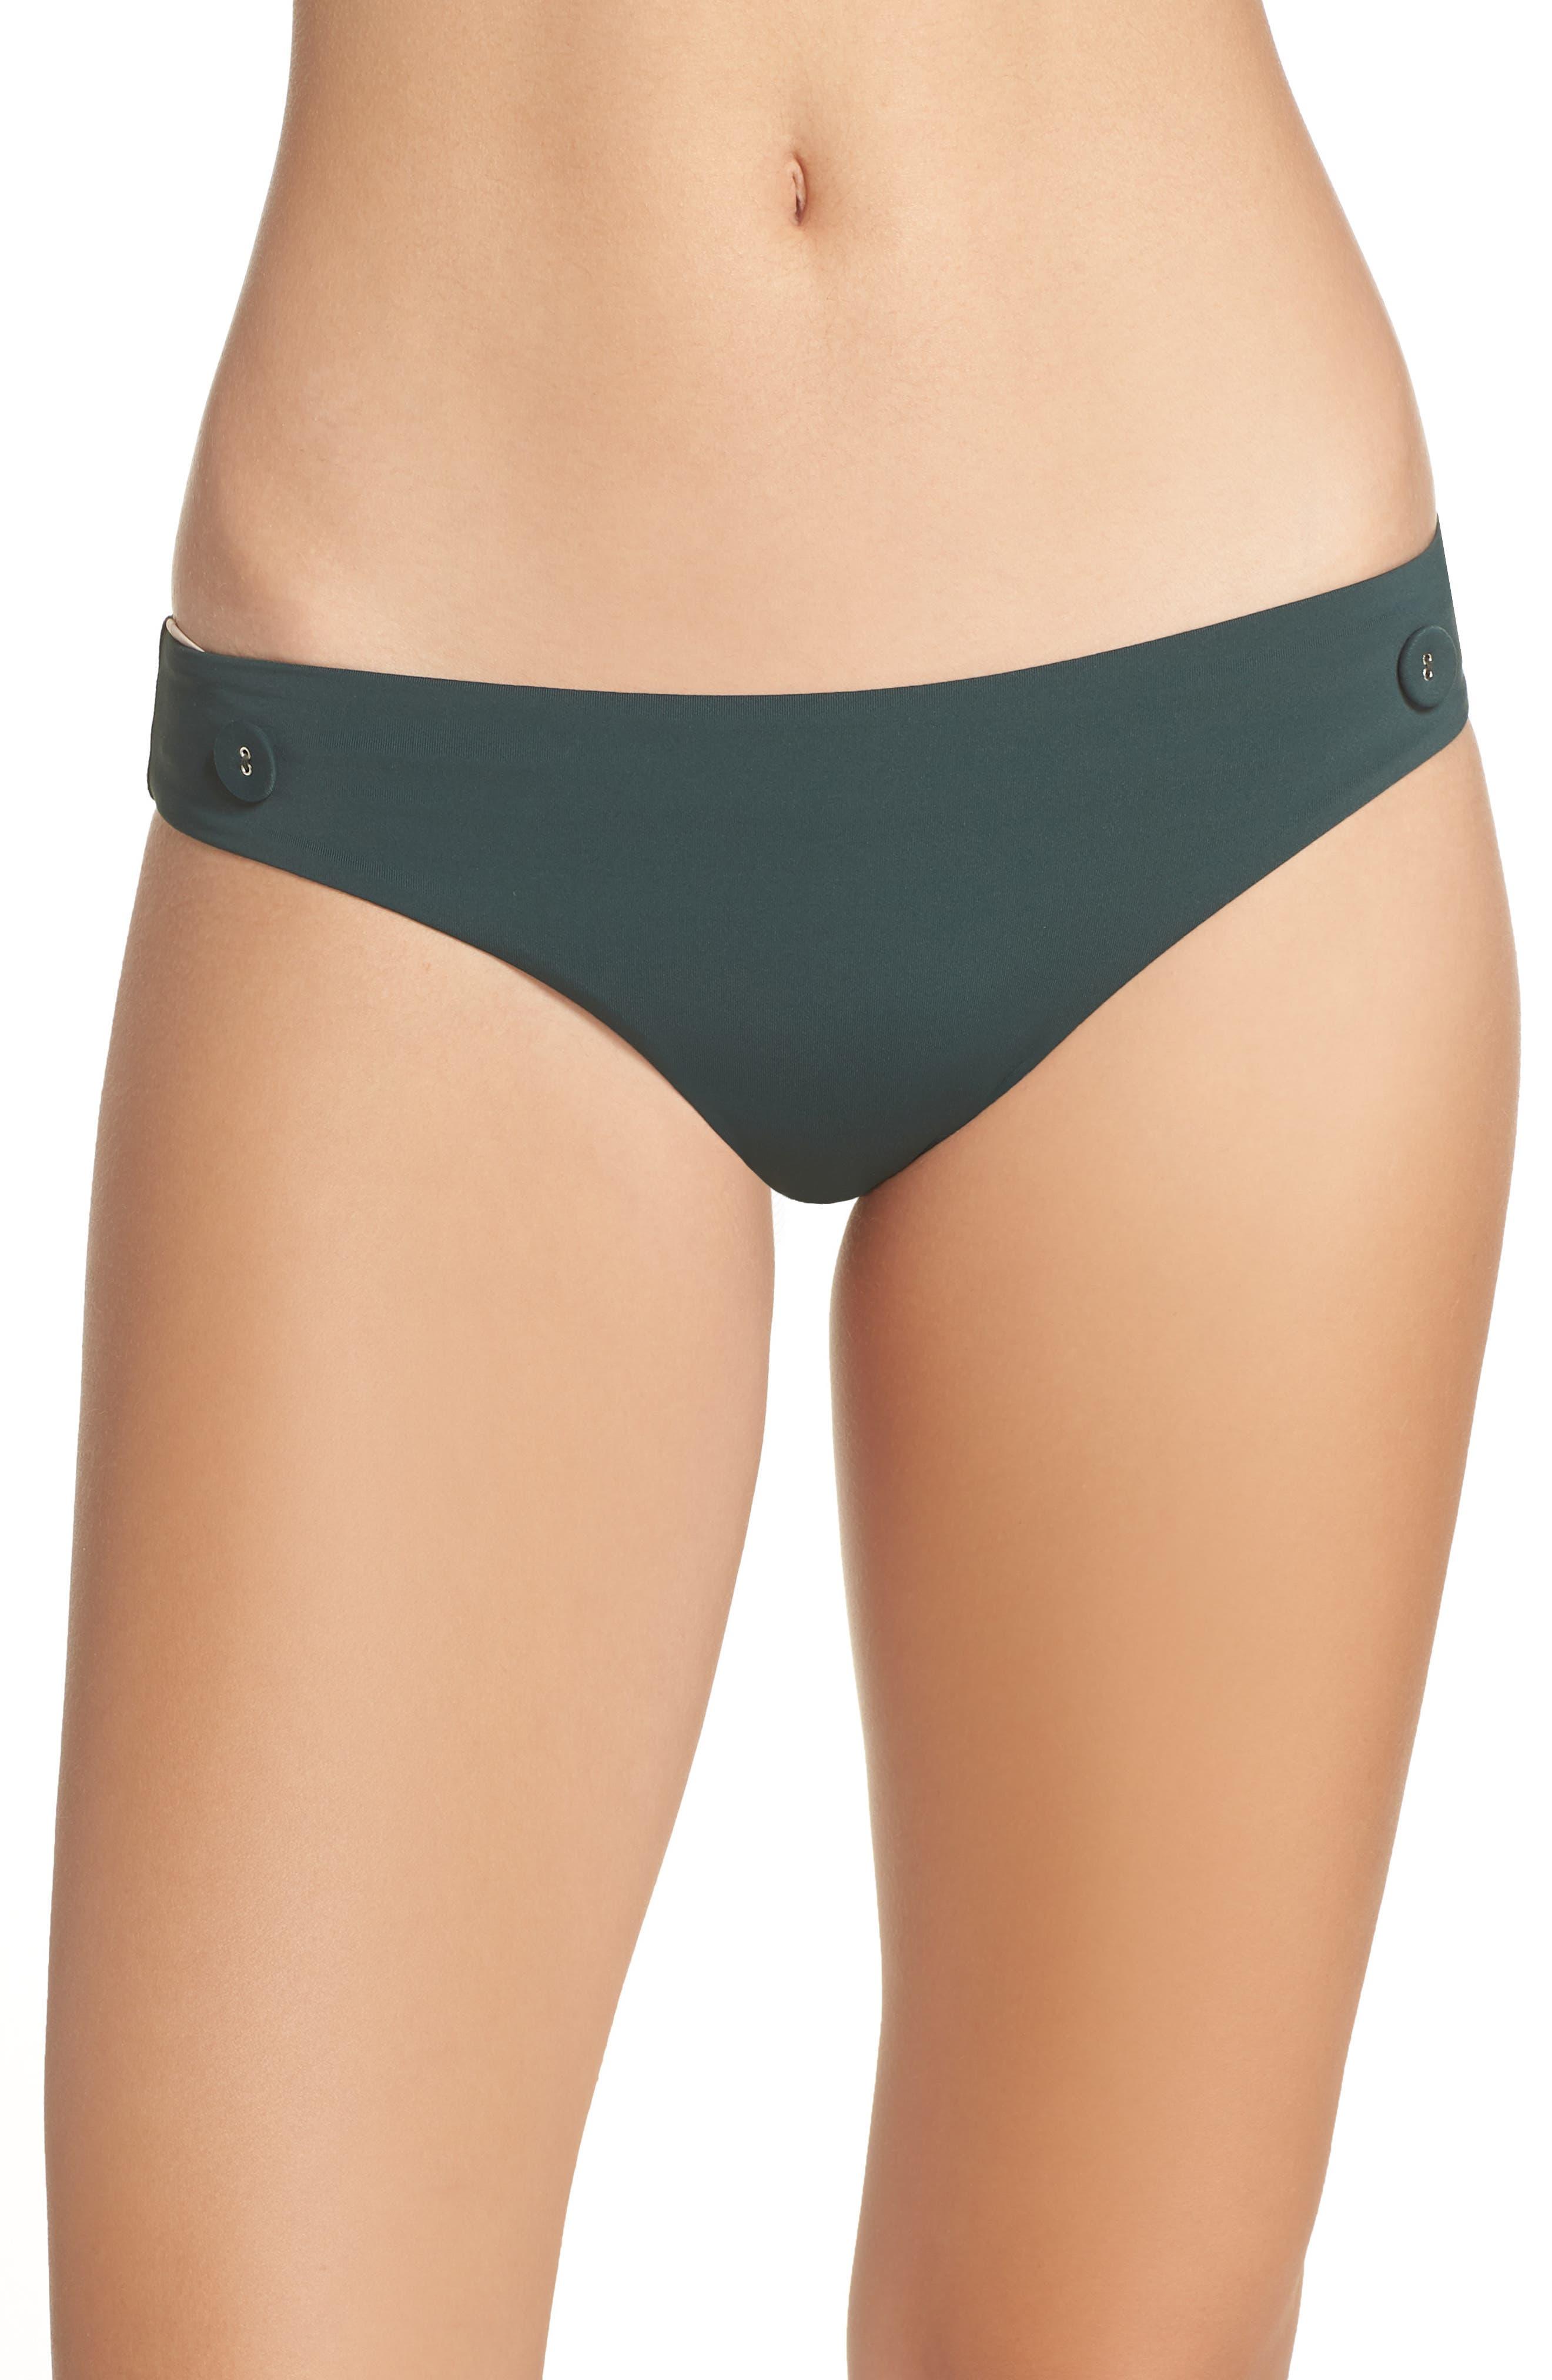 Onia Lily Hipster Bikini Bottoms, Green